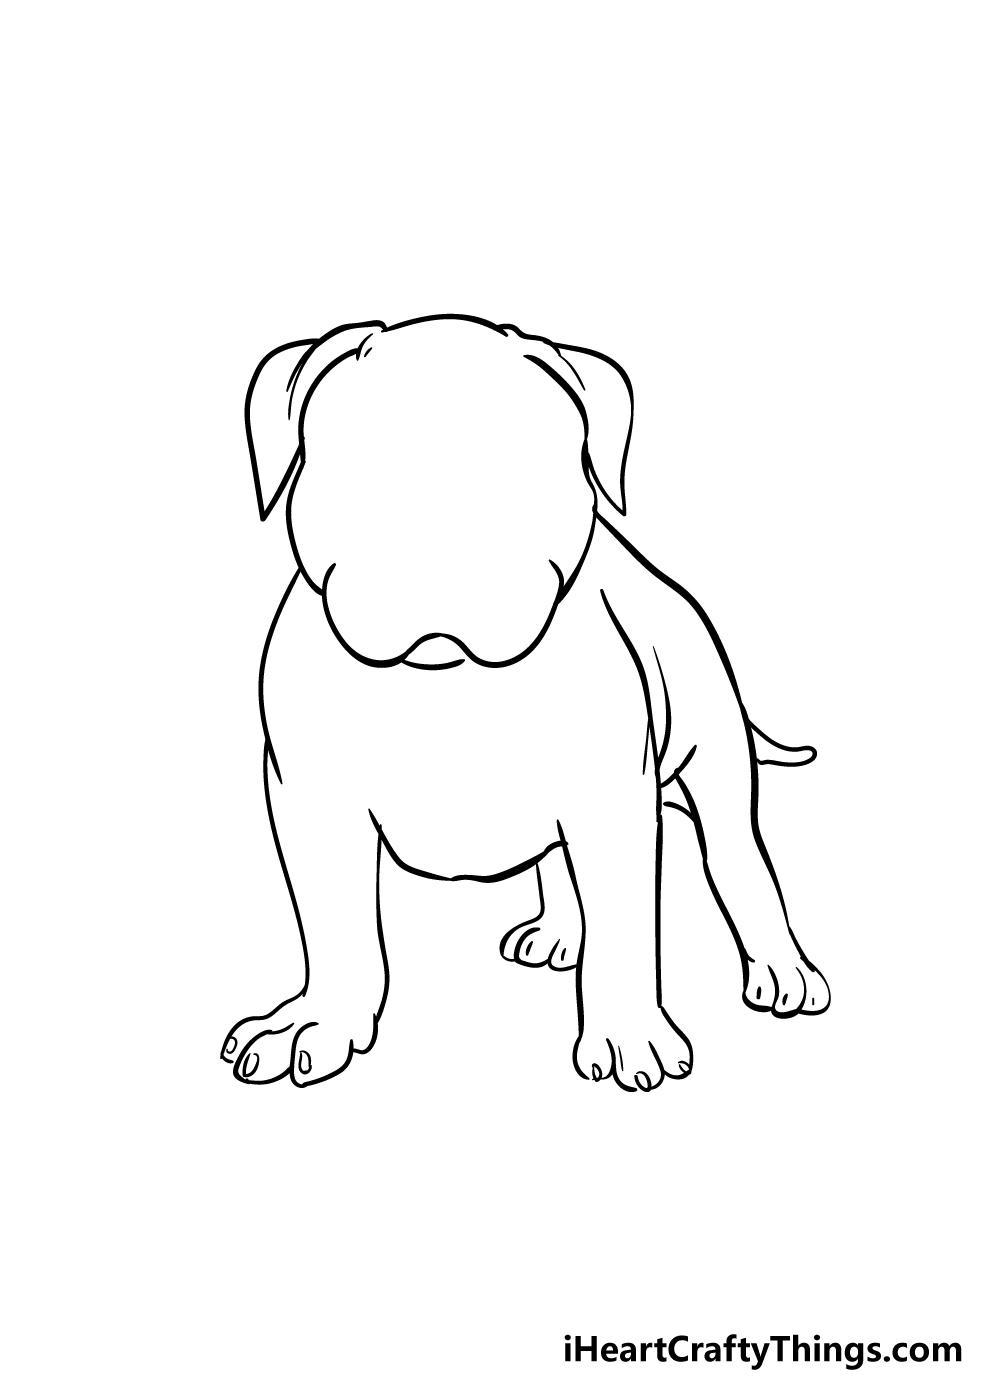 pitbull drawing step 5